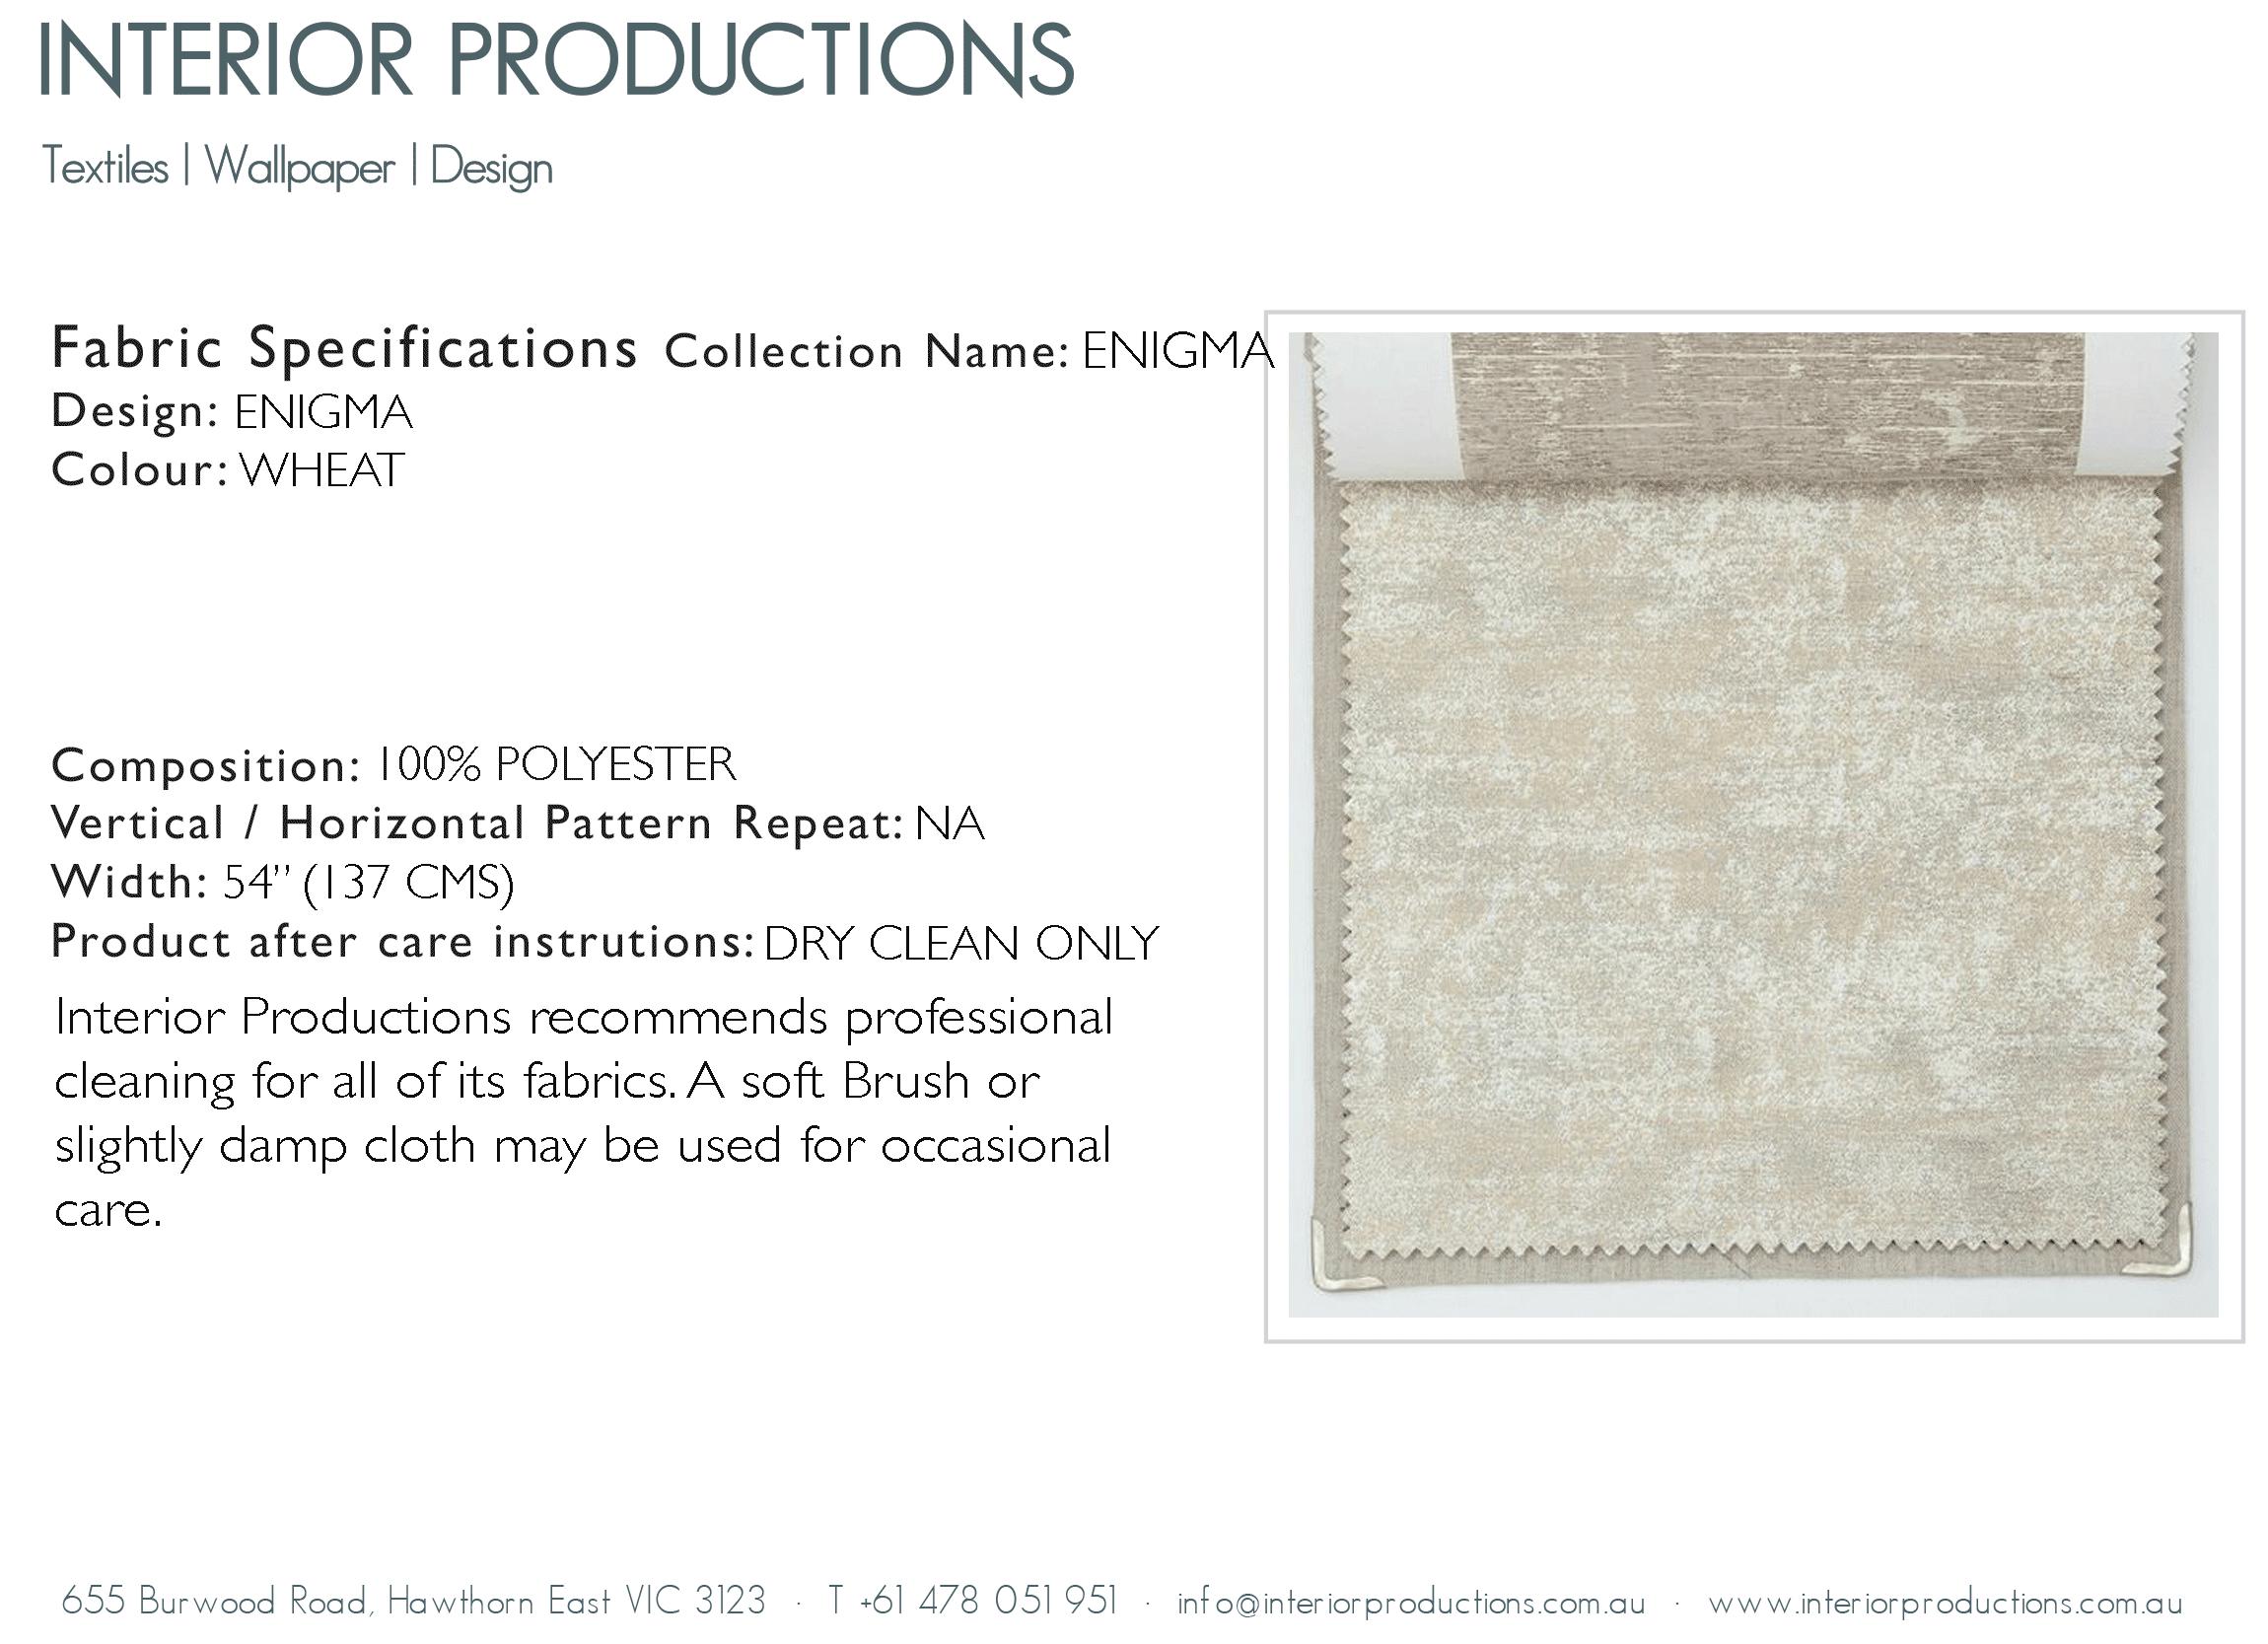 interior_productions_ENIGMA---WHEAT